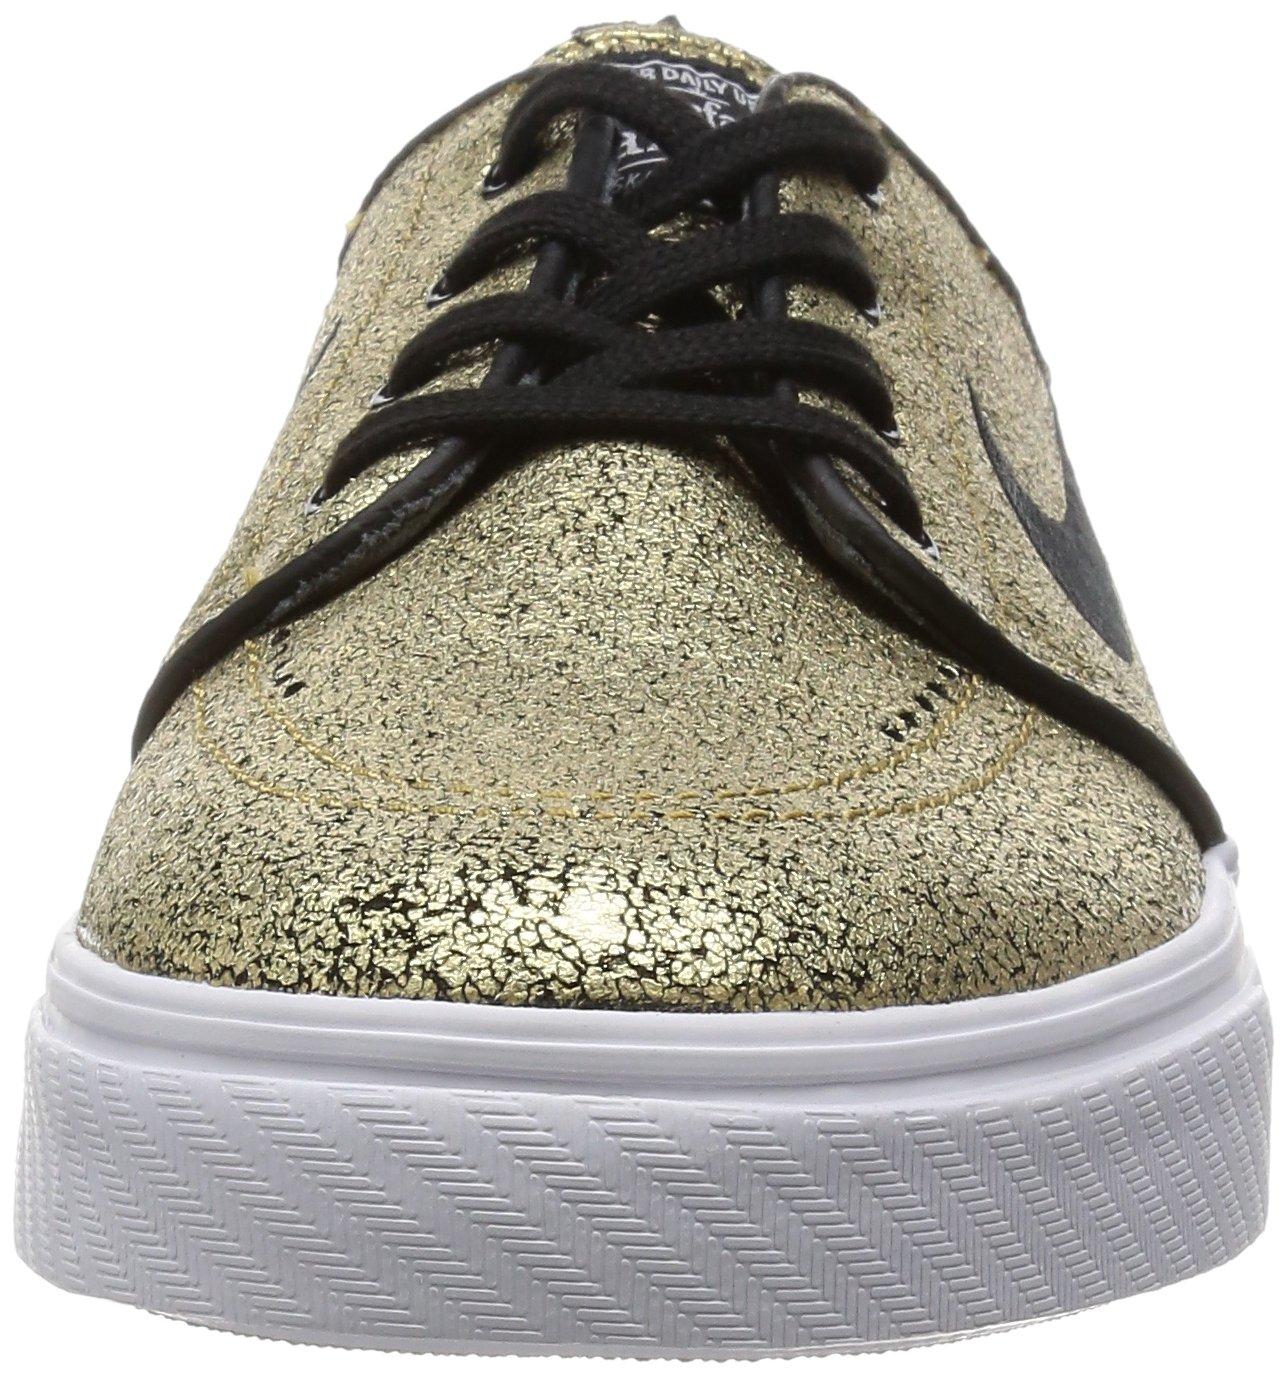 NIKE Men's B017LK6212 Zoom Stefan Janoski Skate Shoe B017LK6212 Men's 9 M US|Gold fab4a1